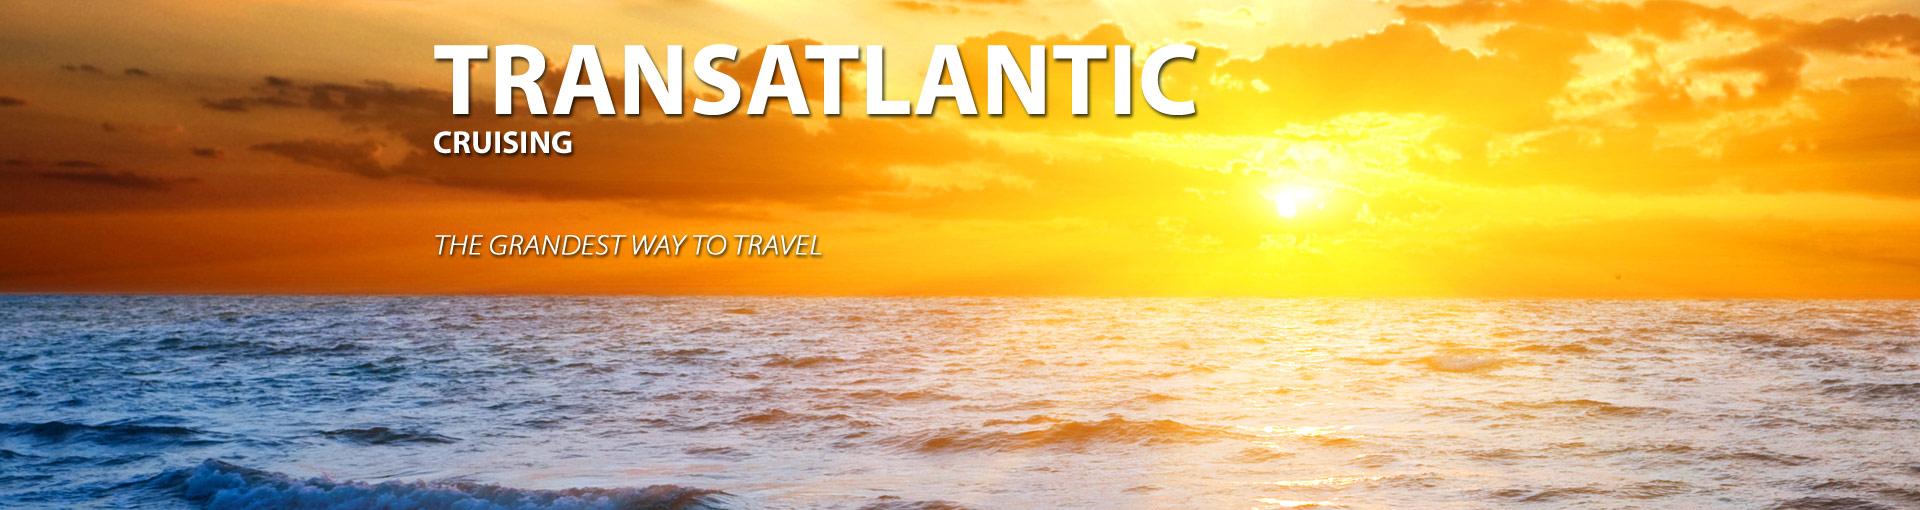 Transatlantic Cruises to travel in style